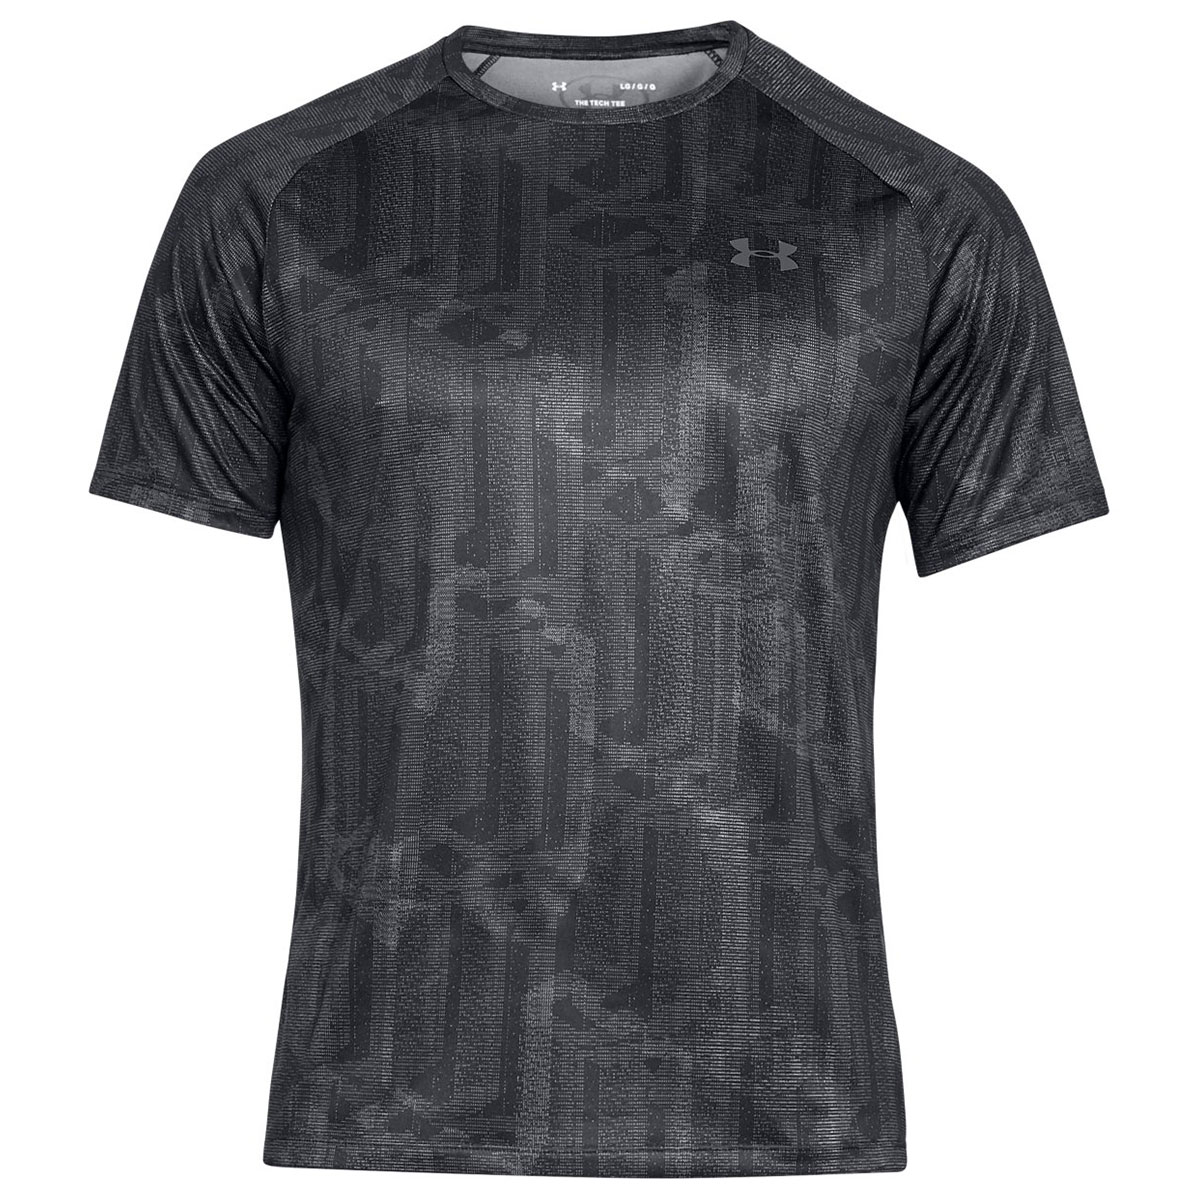 Under-Armour-Mens-UA-Tech-SS-Printed-Moisture-Wicking-T-Shirt-Tee-27-OFF-RRP thumbnail 4